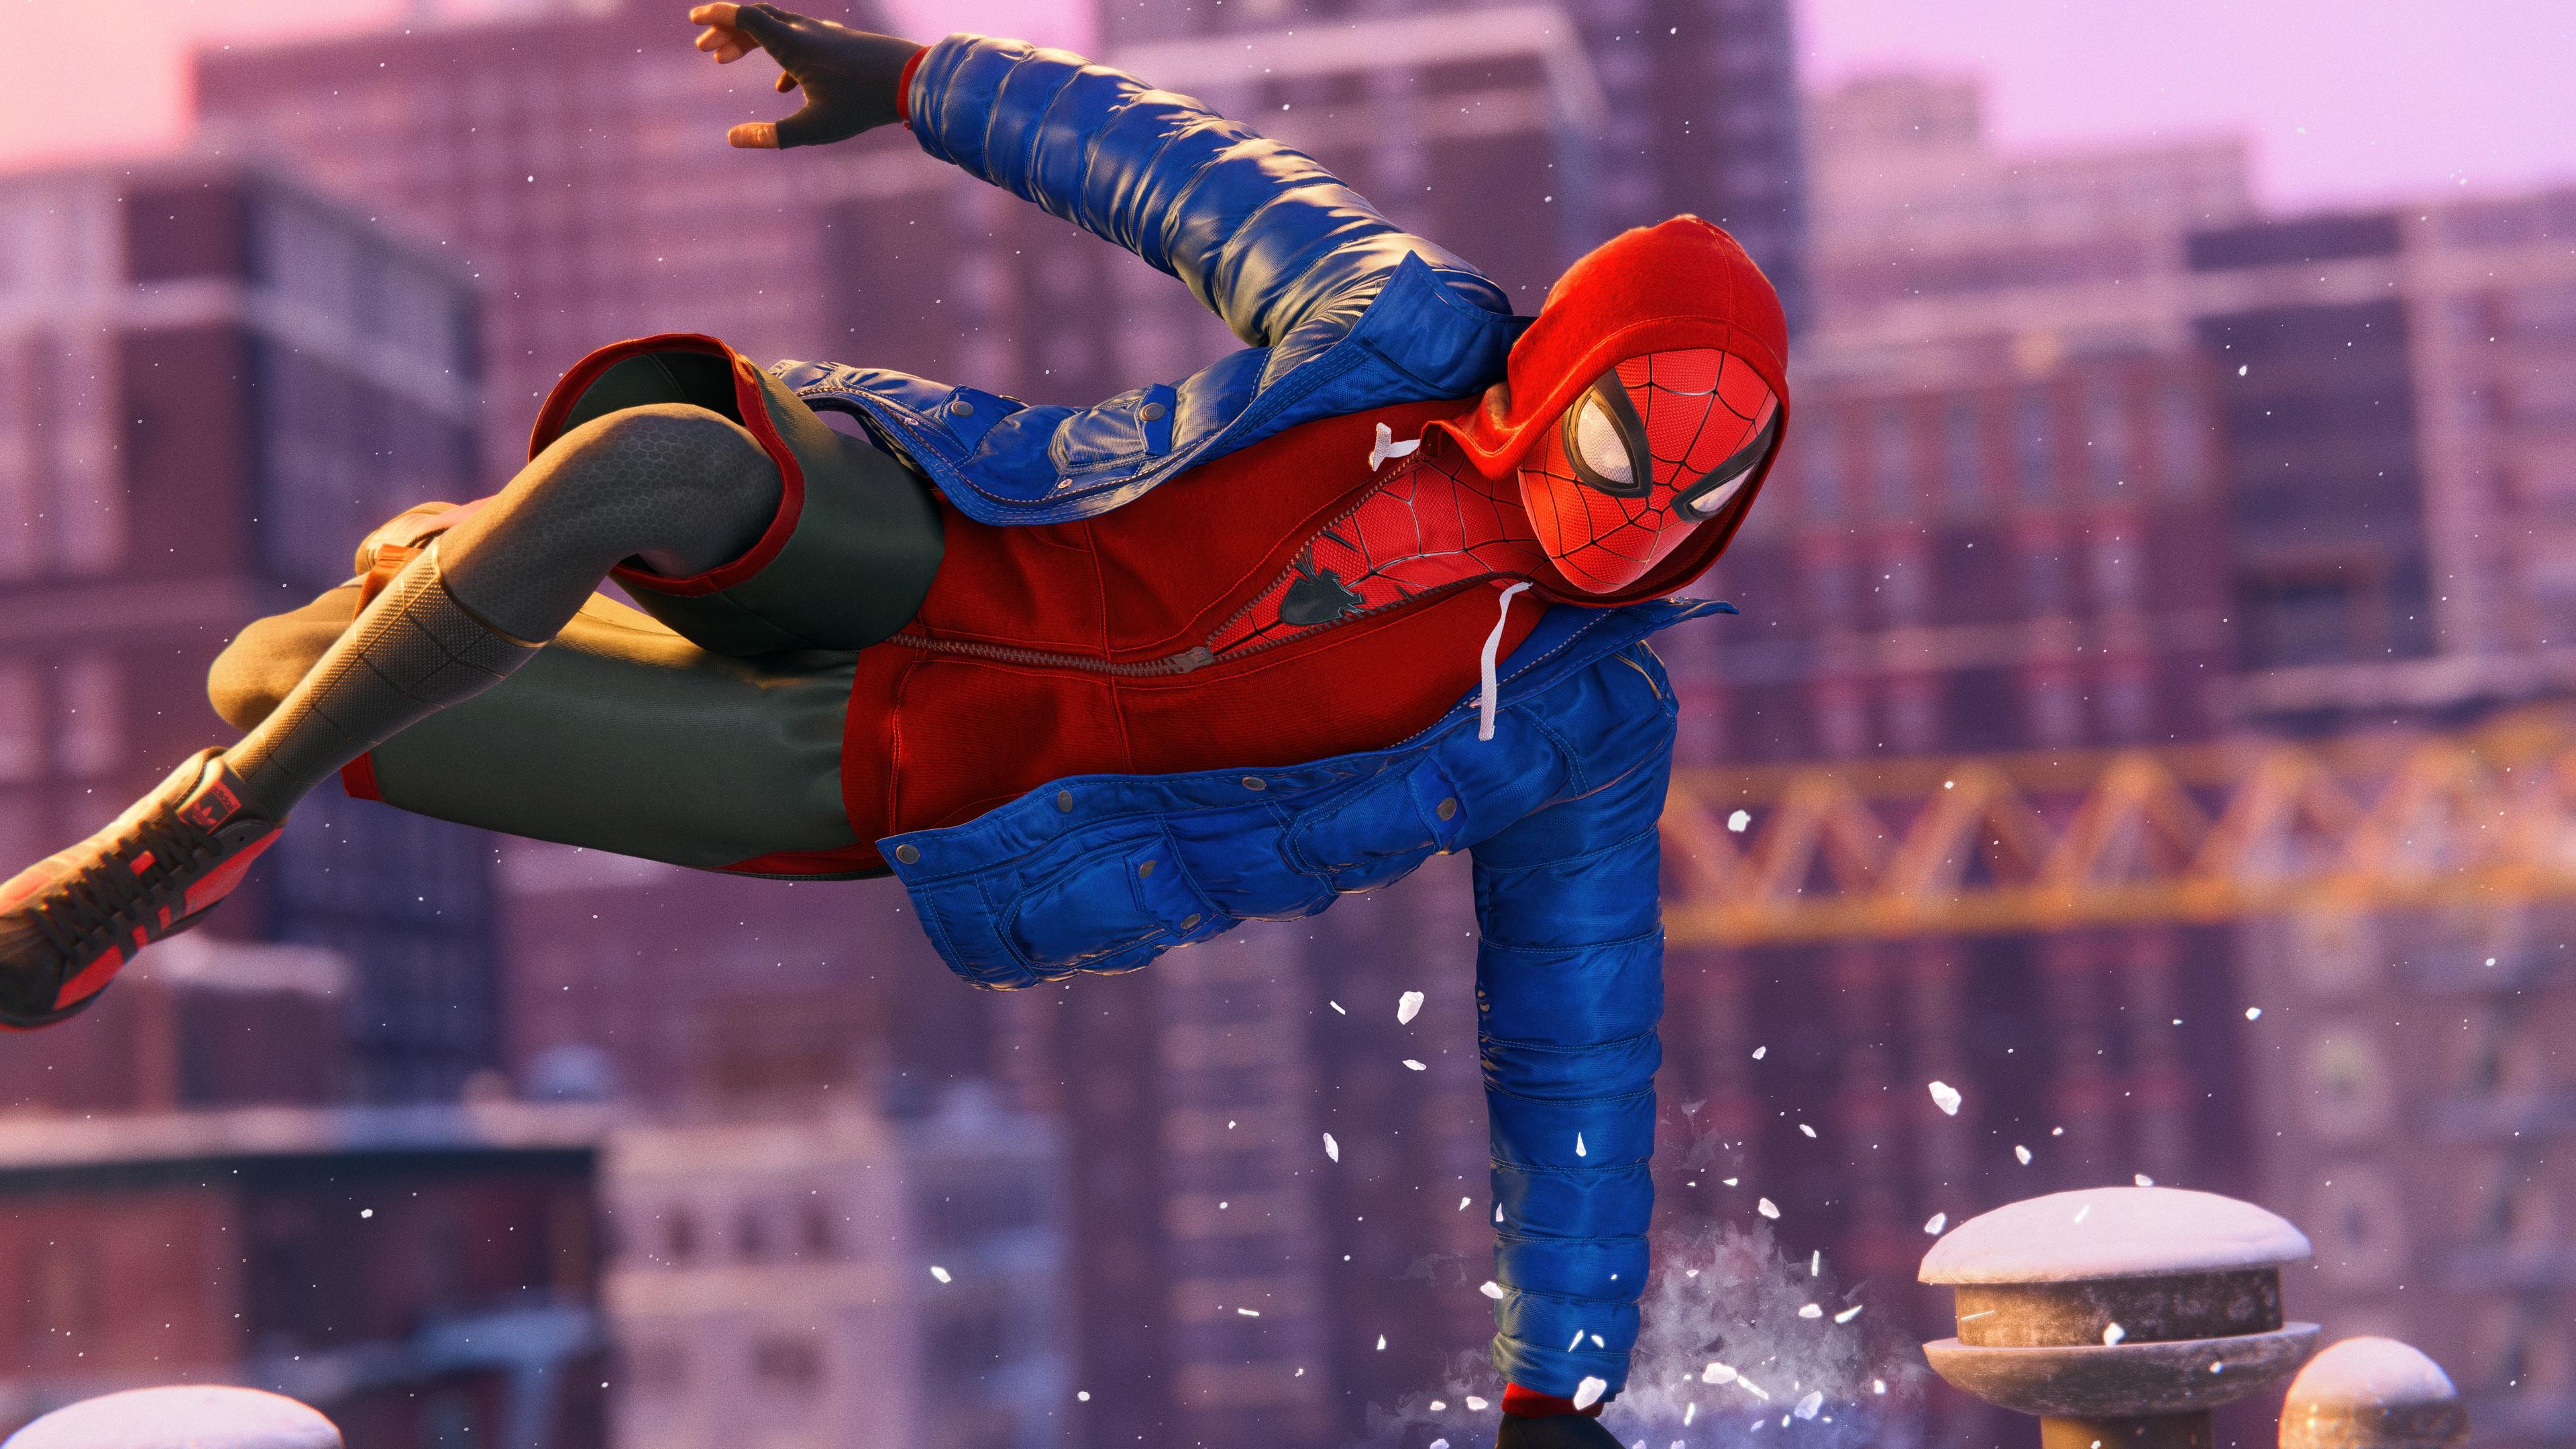 "<em>Marvel's Spider-Man: Miles Morales</em>."" data-height=""2160″ data-width=""3840″ href=""https://cdn.arstechnica.net/wp-content/uploads/2020/11/Marvels-Spider-Man_-Miles-Morales_20201102224048.jpg"">Marvel's Spider-Man: Miles Morales</em>."" height=""360″ src=""https://cdn.arstechnica.net/wp-content/uploads/2020/11/Marvels-Spider-Man_-Miles-Morales_20201102224048-640×360.jpg""  width=""640″></img></a><figcaption> <p><a data-height="